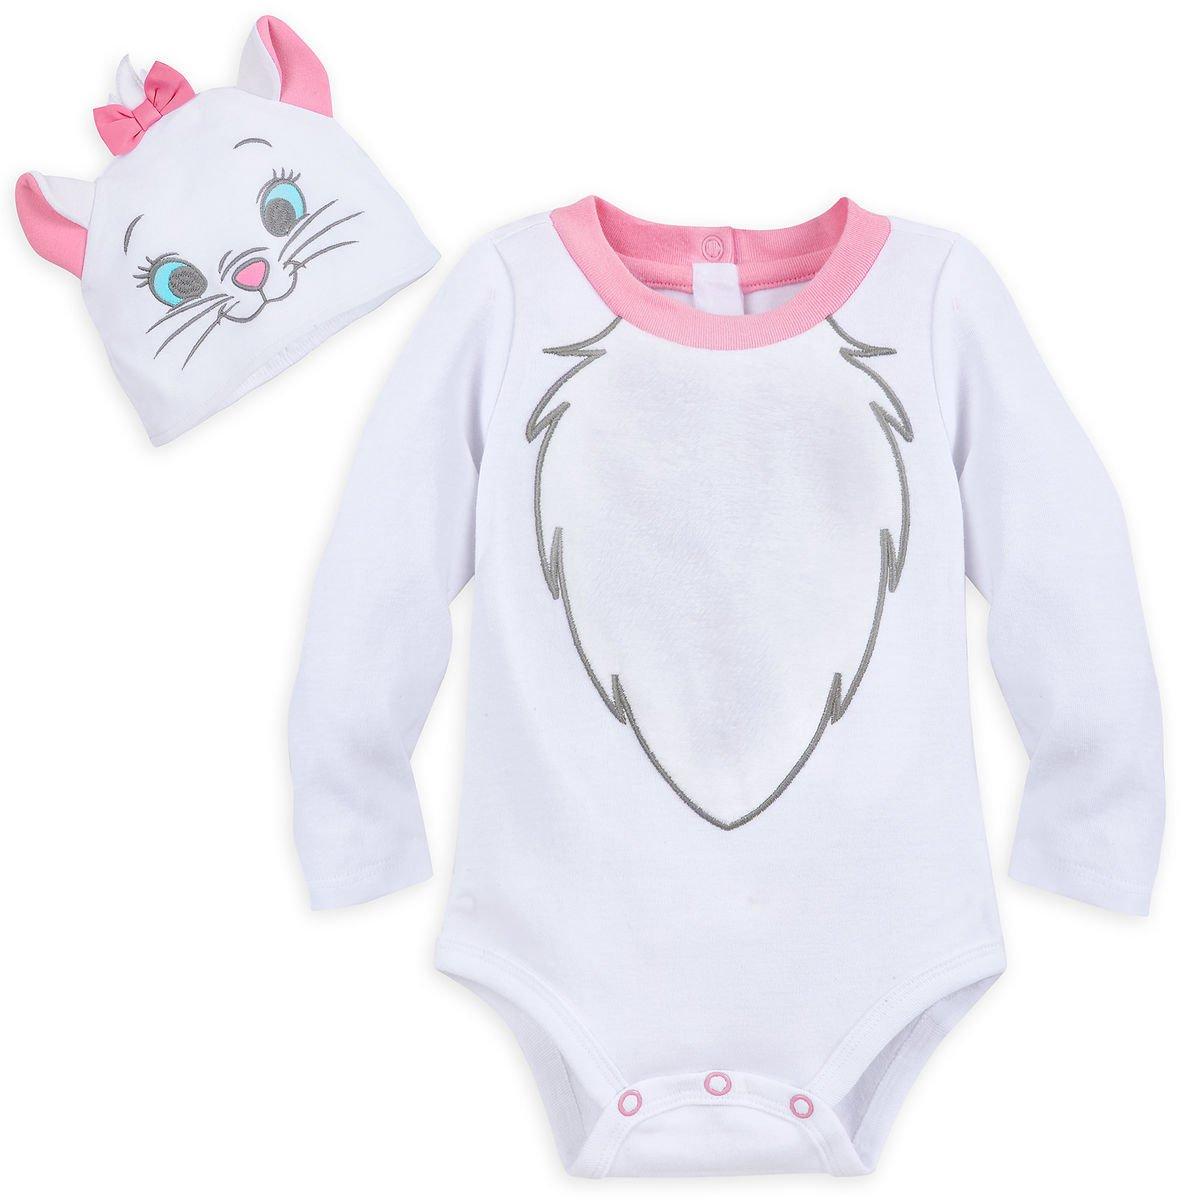 Disney Store Marie Baby Costume Bodysuit Hat 3-6 Months 2018 New